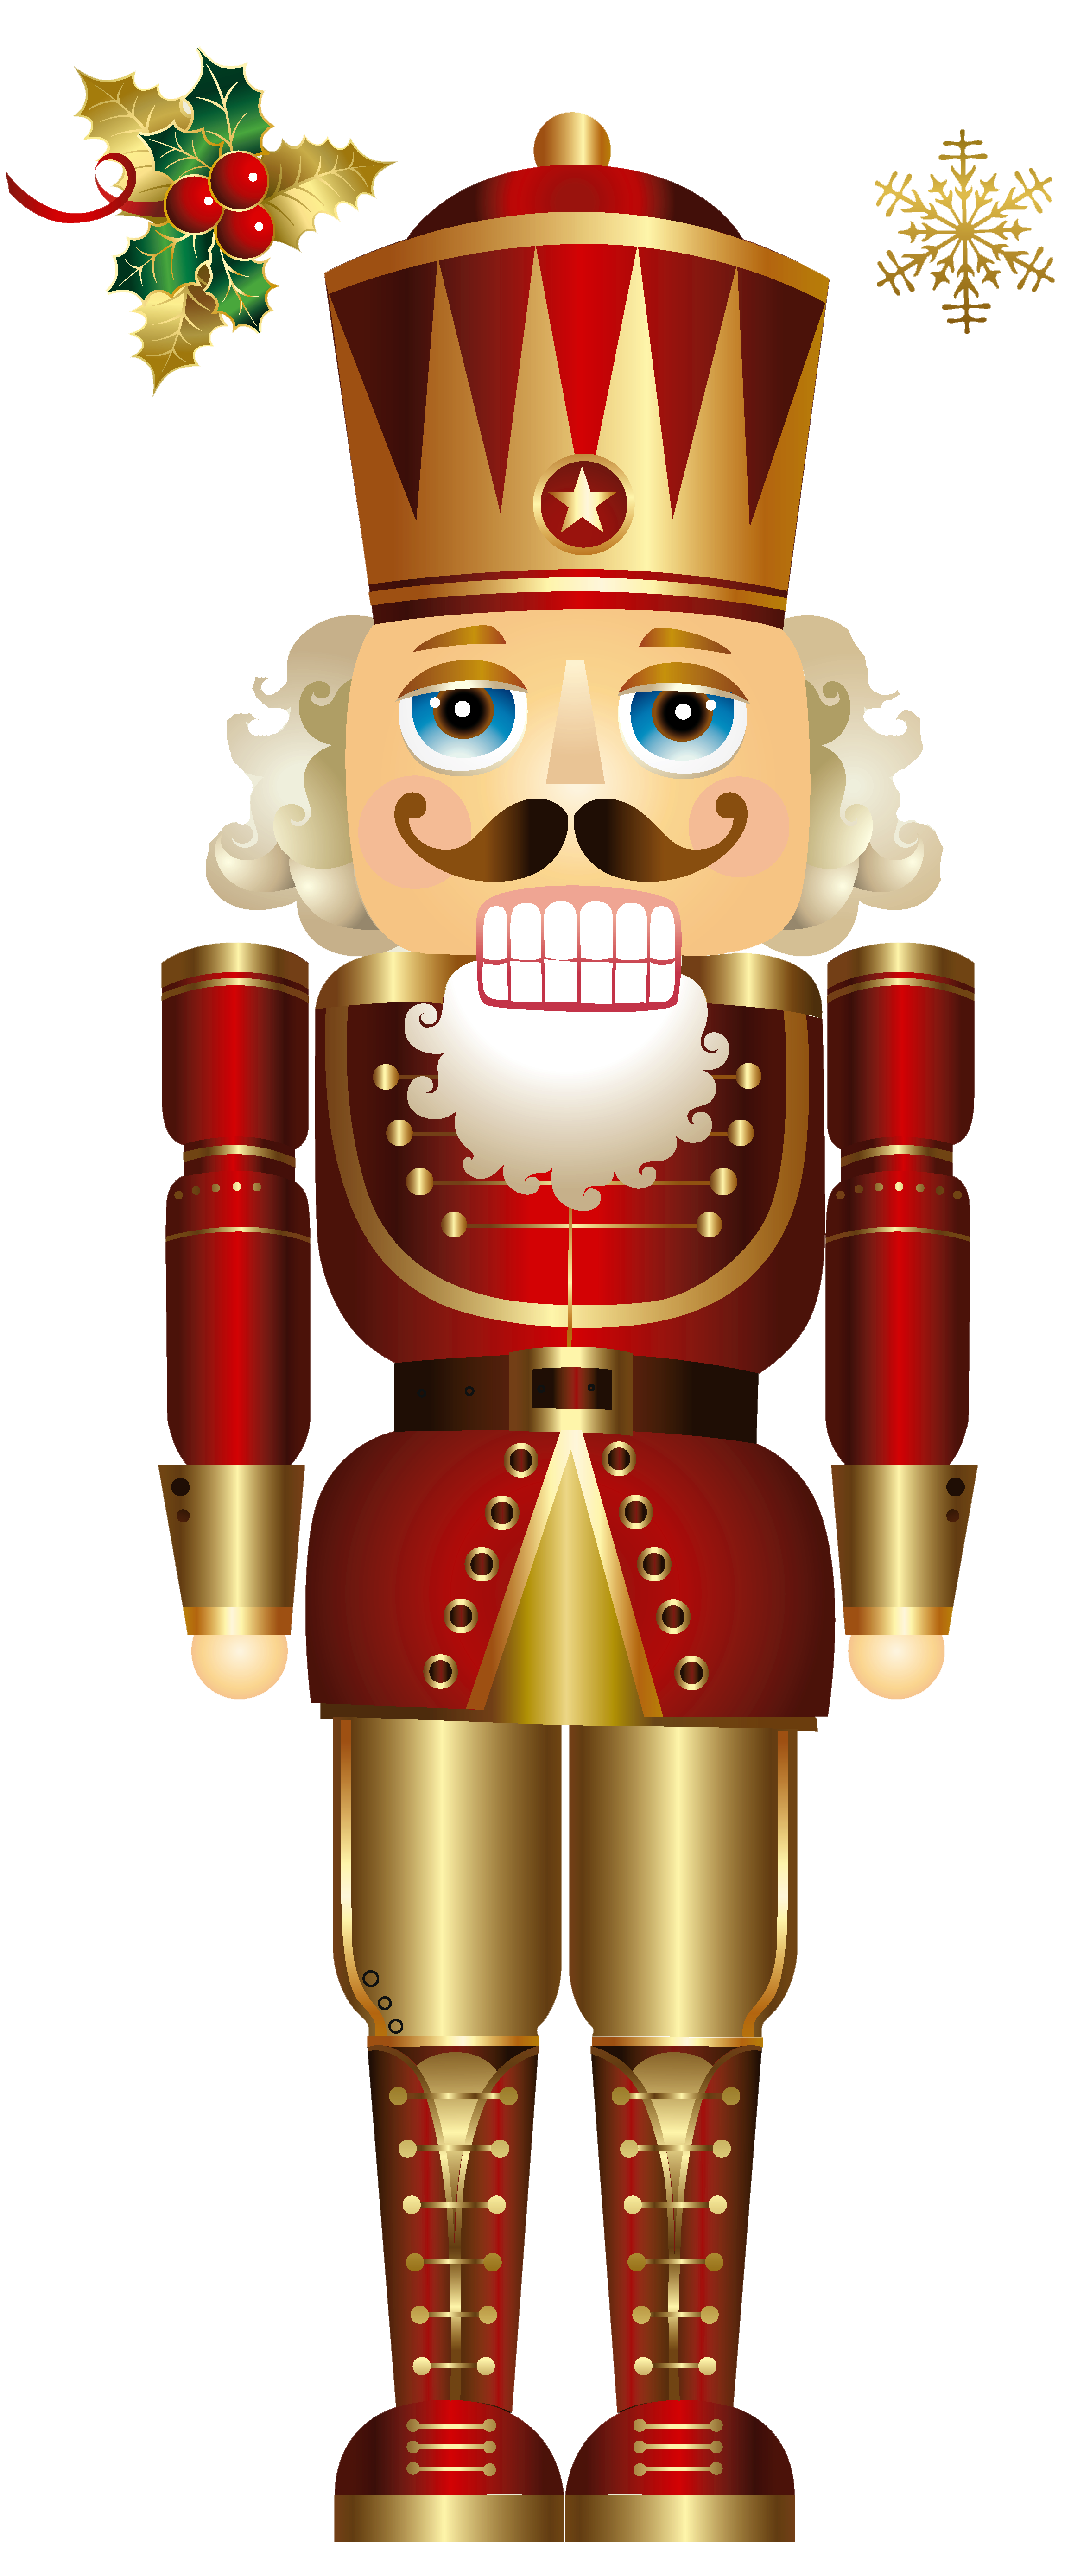 Free Christmas Nutcracker .-Free Christmas Nutcracker .-3